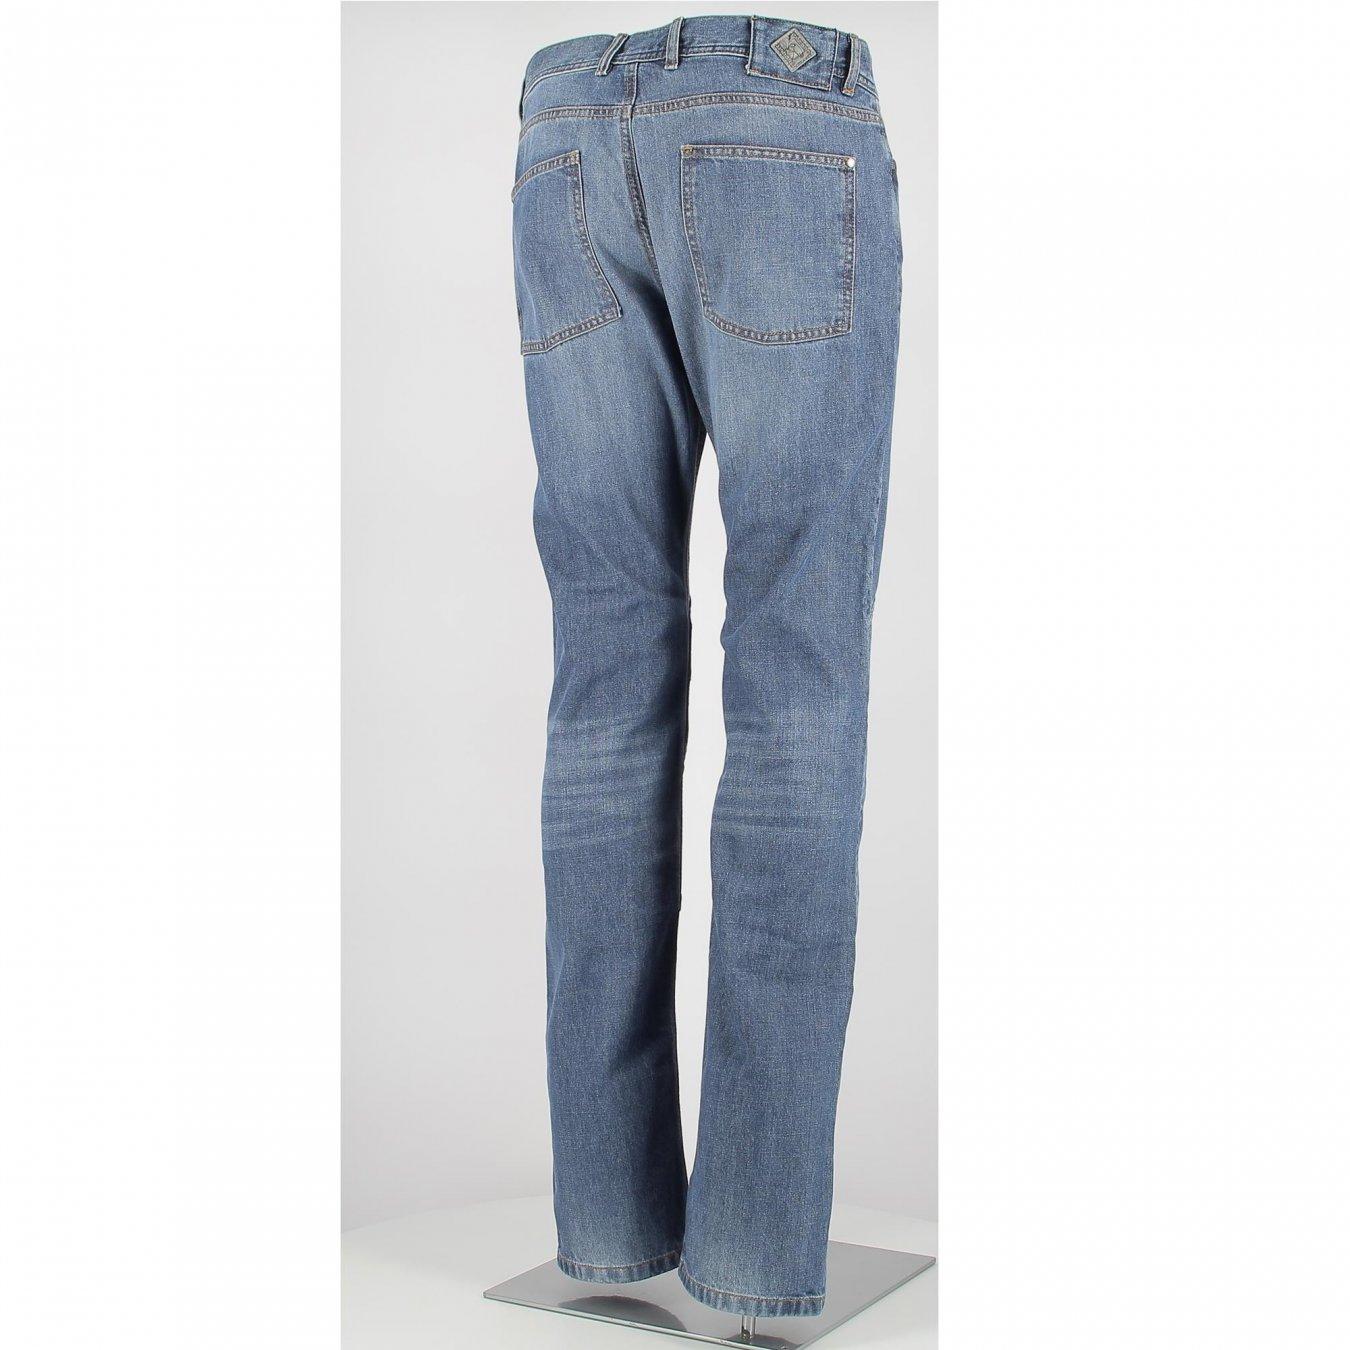 Pantalone-Denim-Tucanourbano-K-gins-Con-Kevlar-Blu